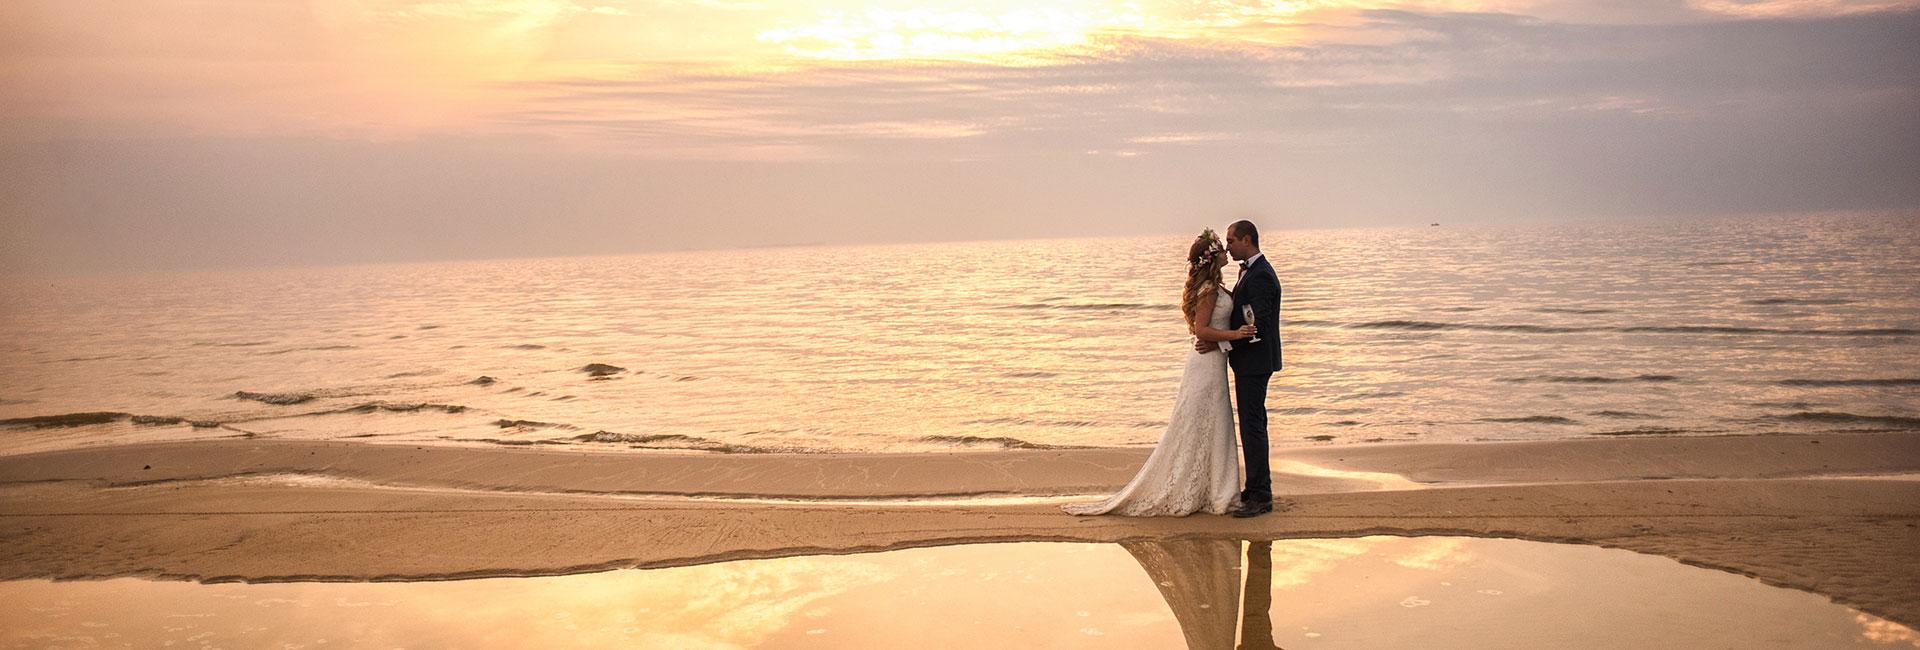 The best places for a destination wedding